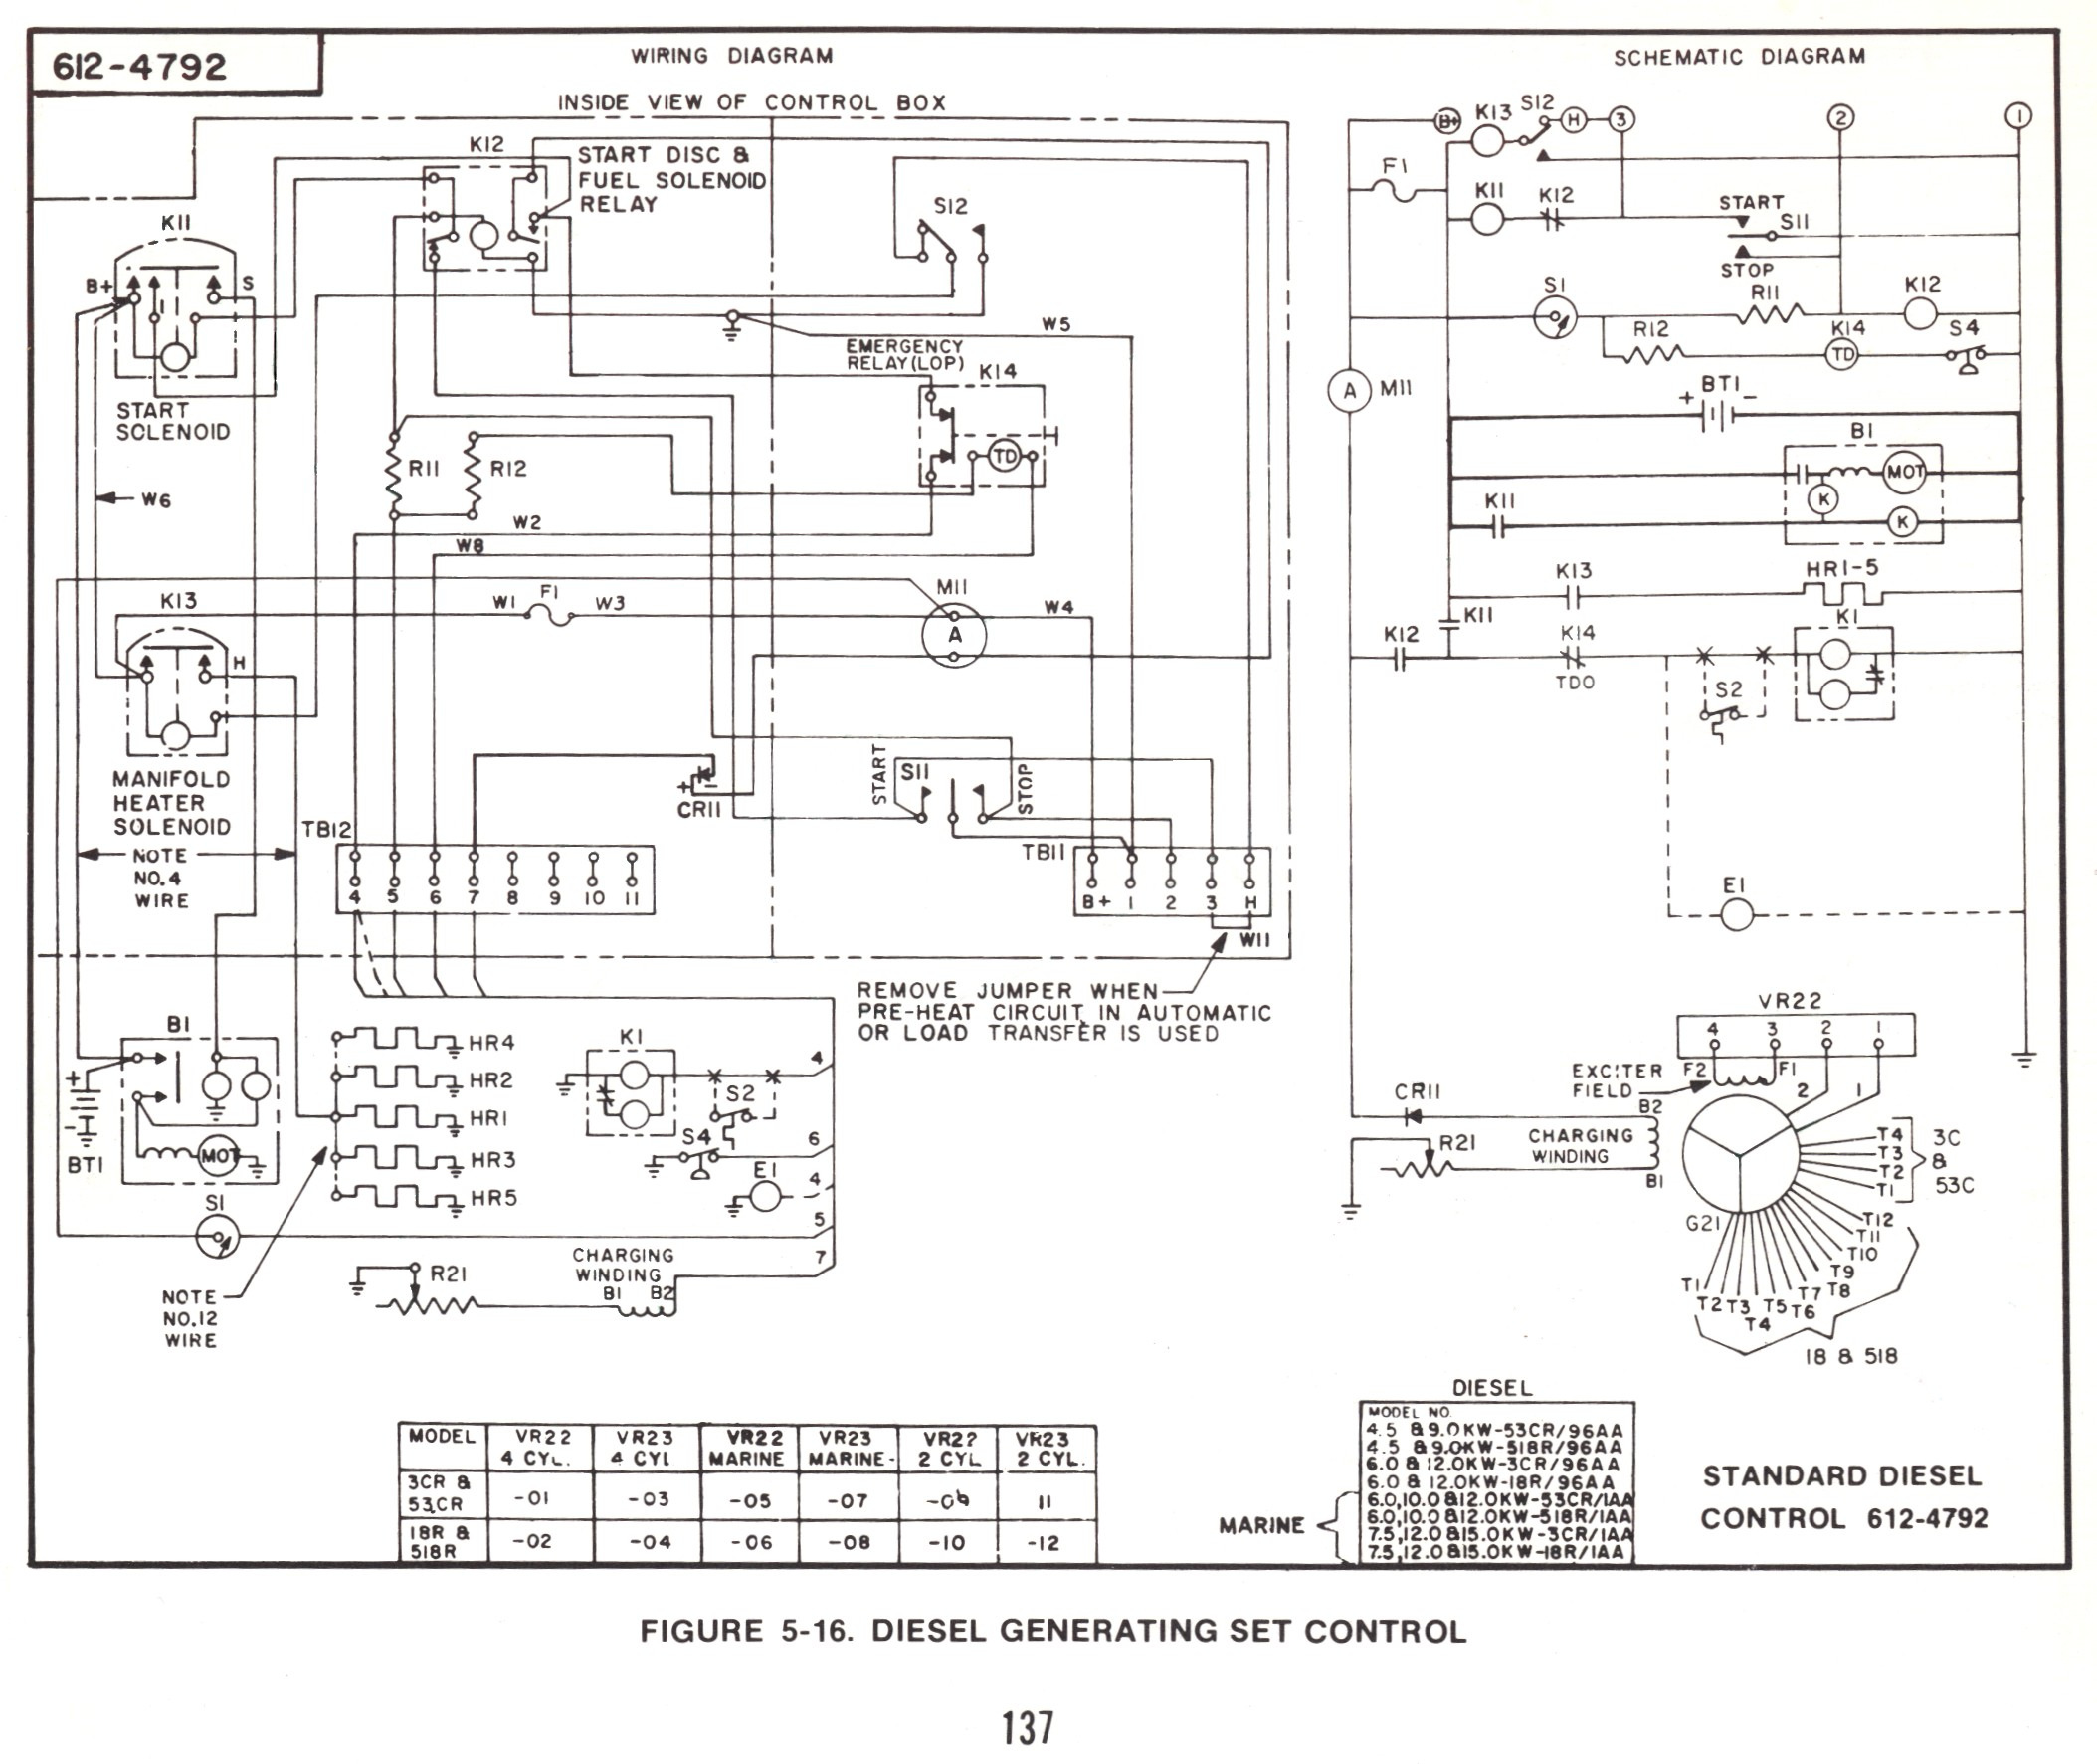 onan engine parts diagram an stuff in rv generator wiring diagram rh detoxicrecenze com